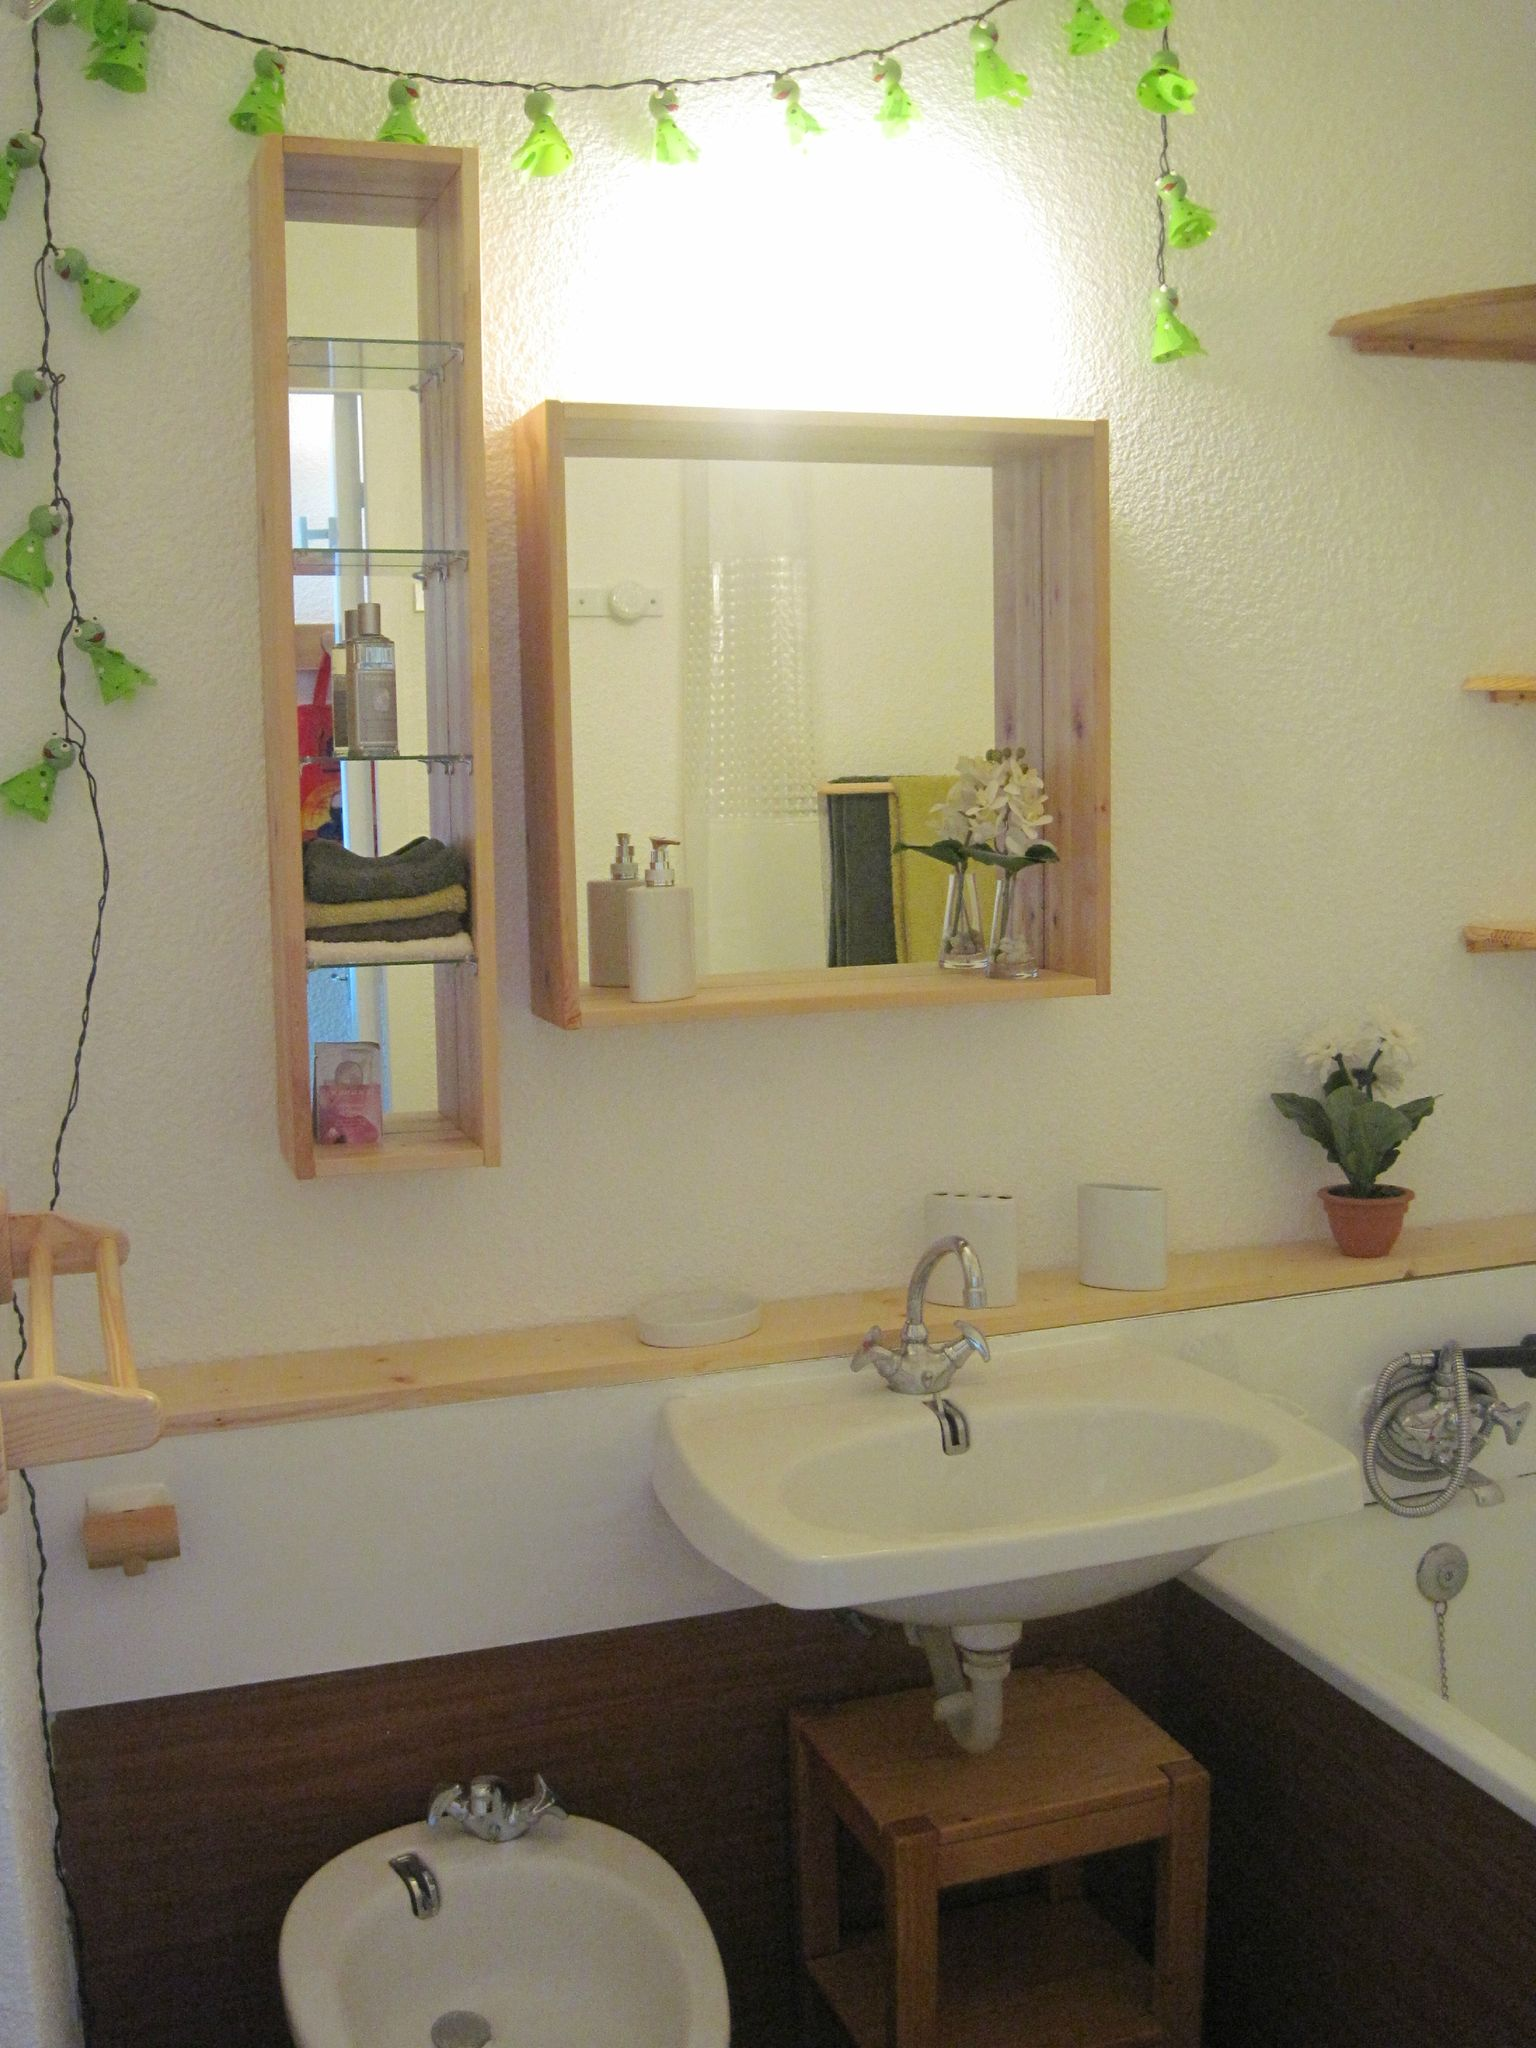 Salle de bain du studio